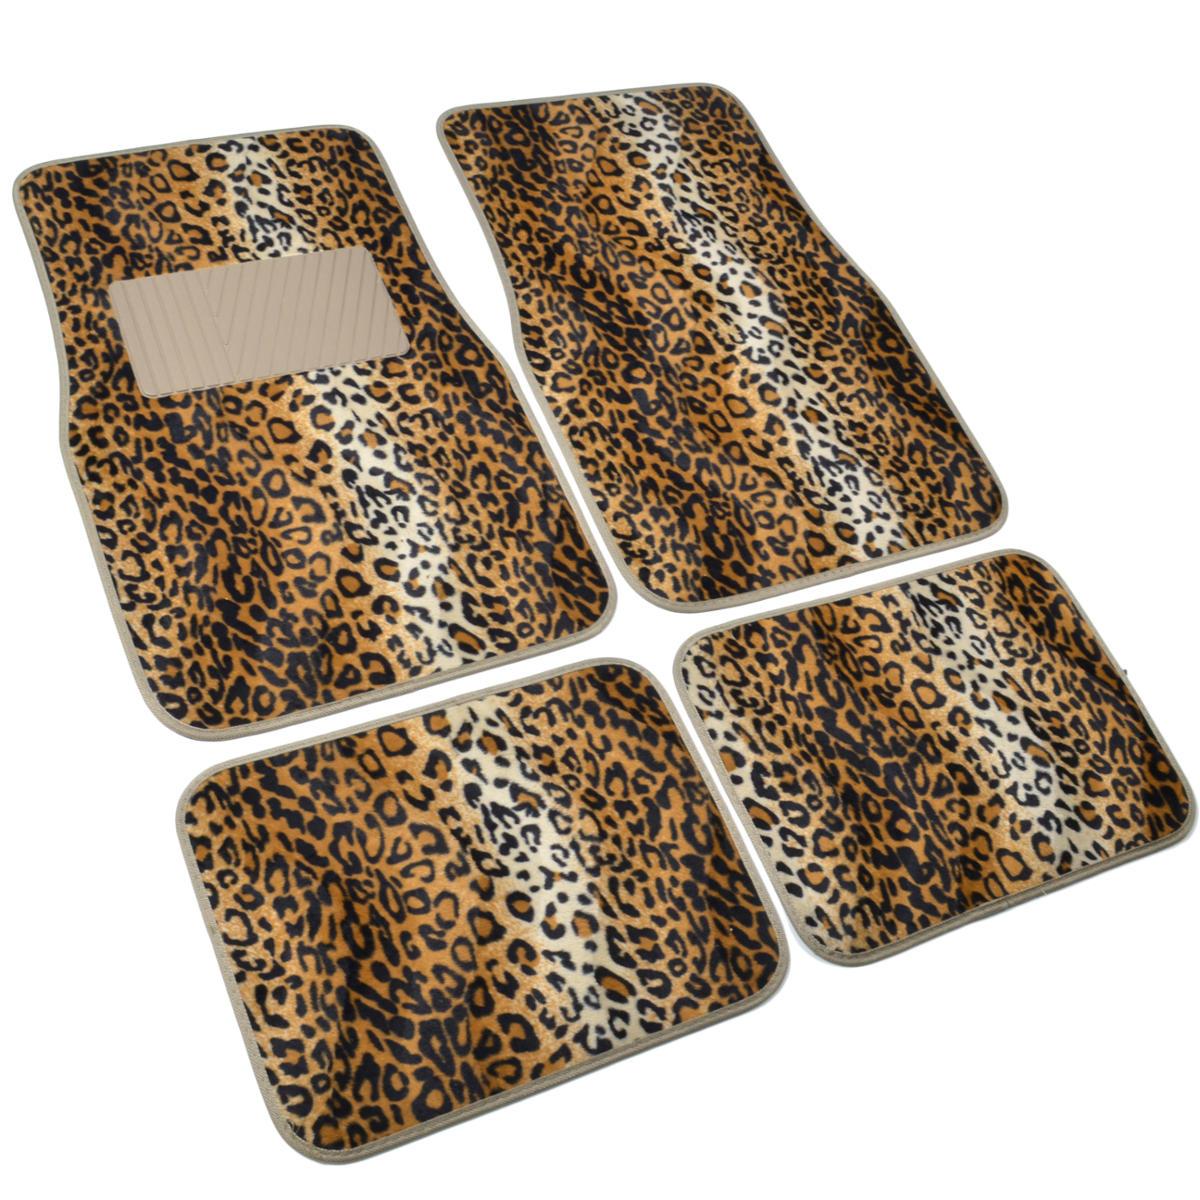 Supreme Leopard Beige 4 Piece Plush High Quality Car